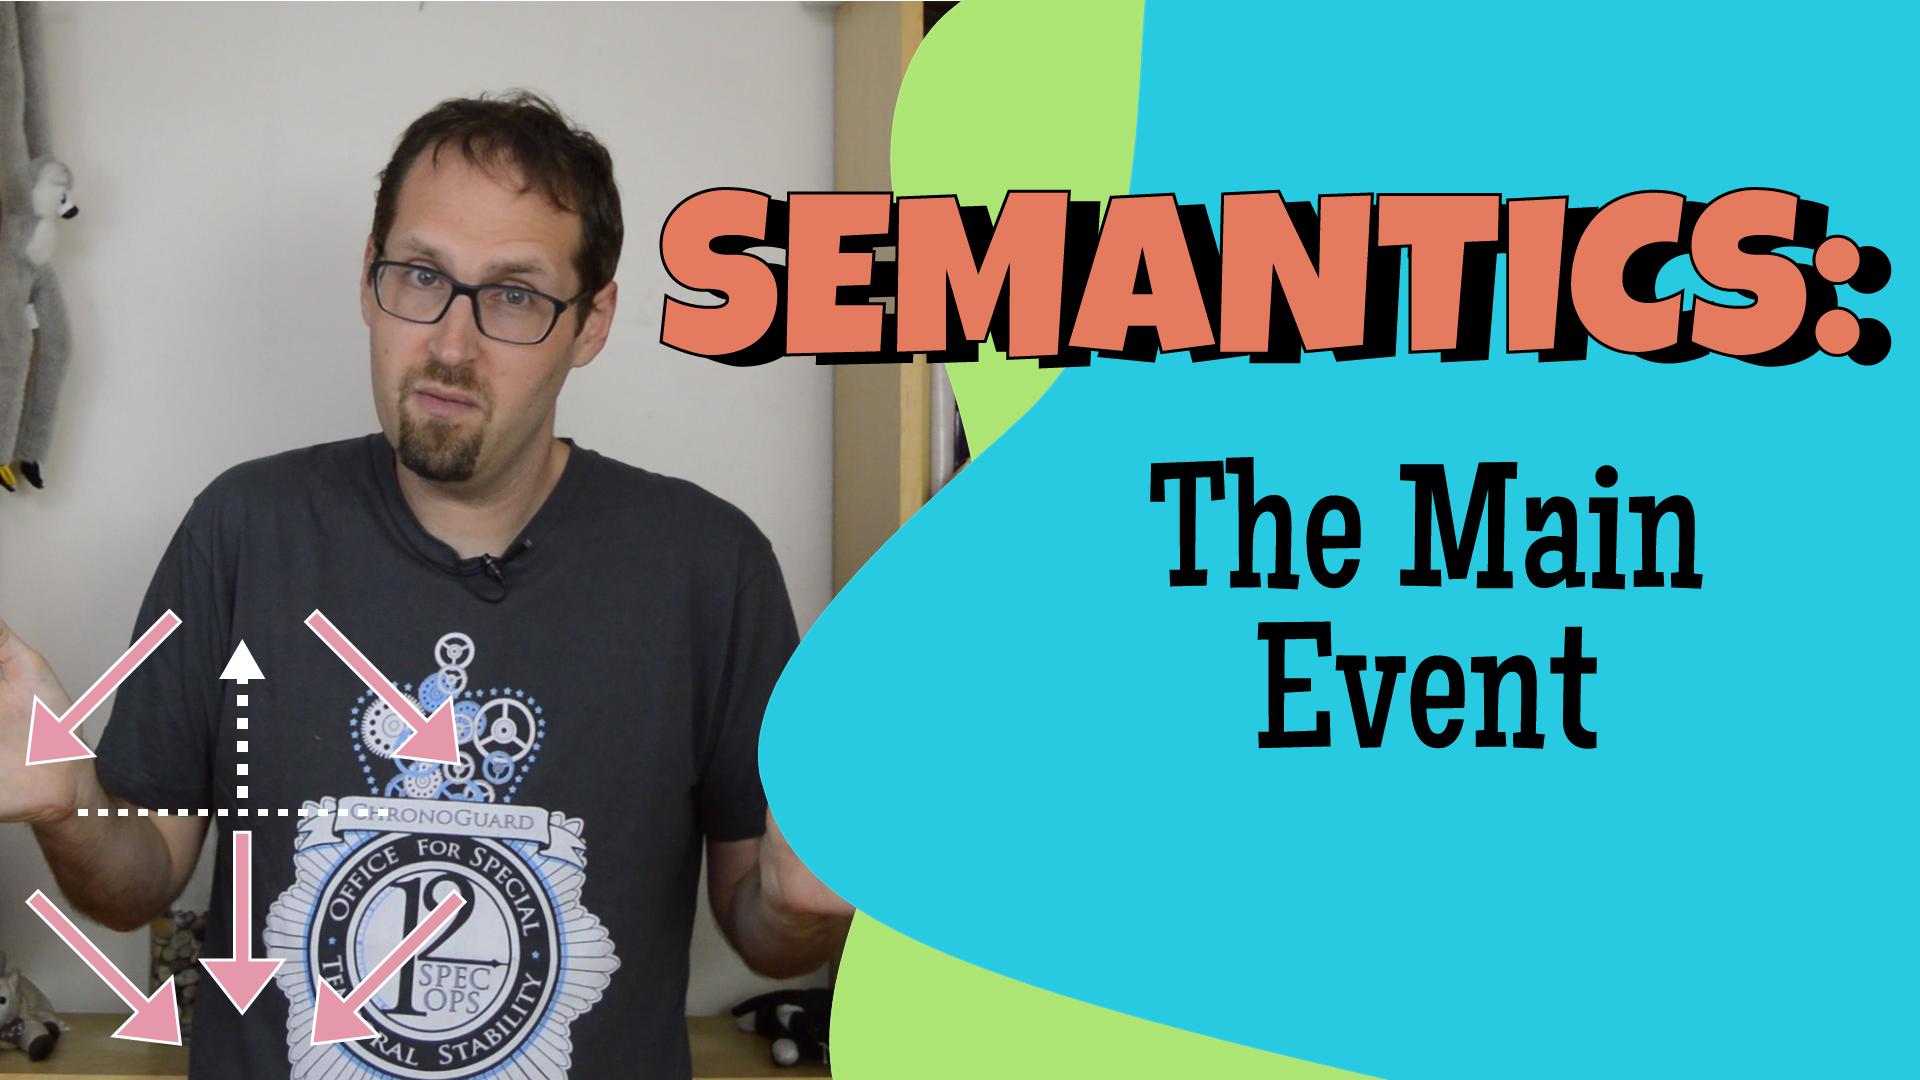 Event Semantics